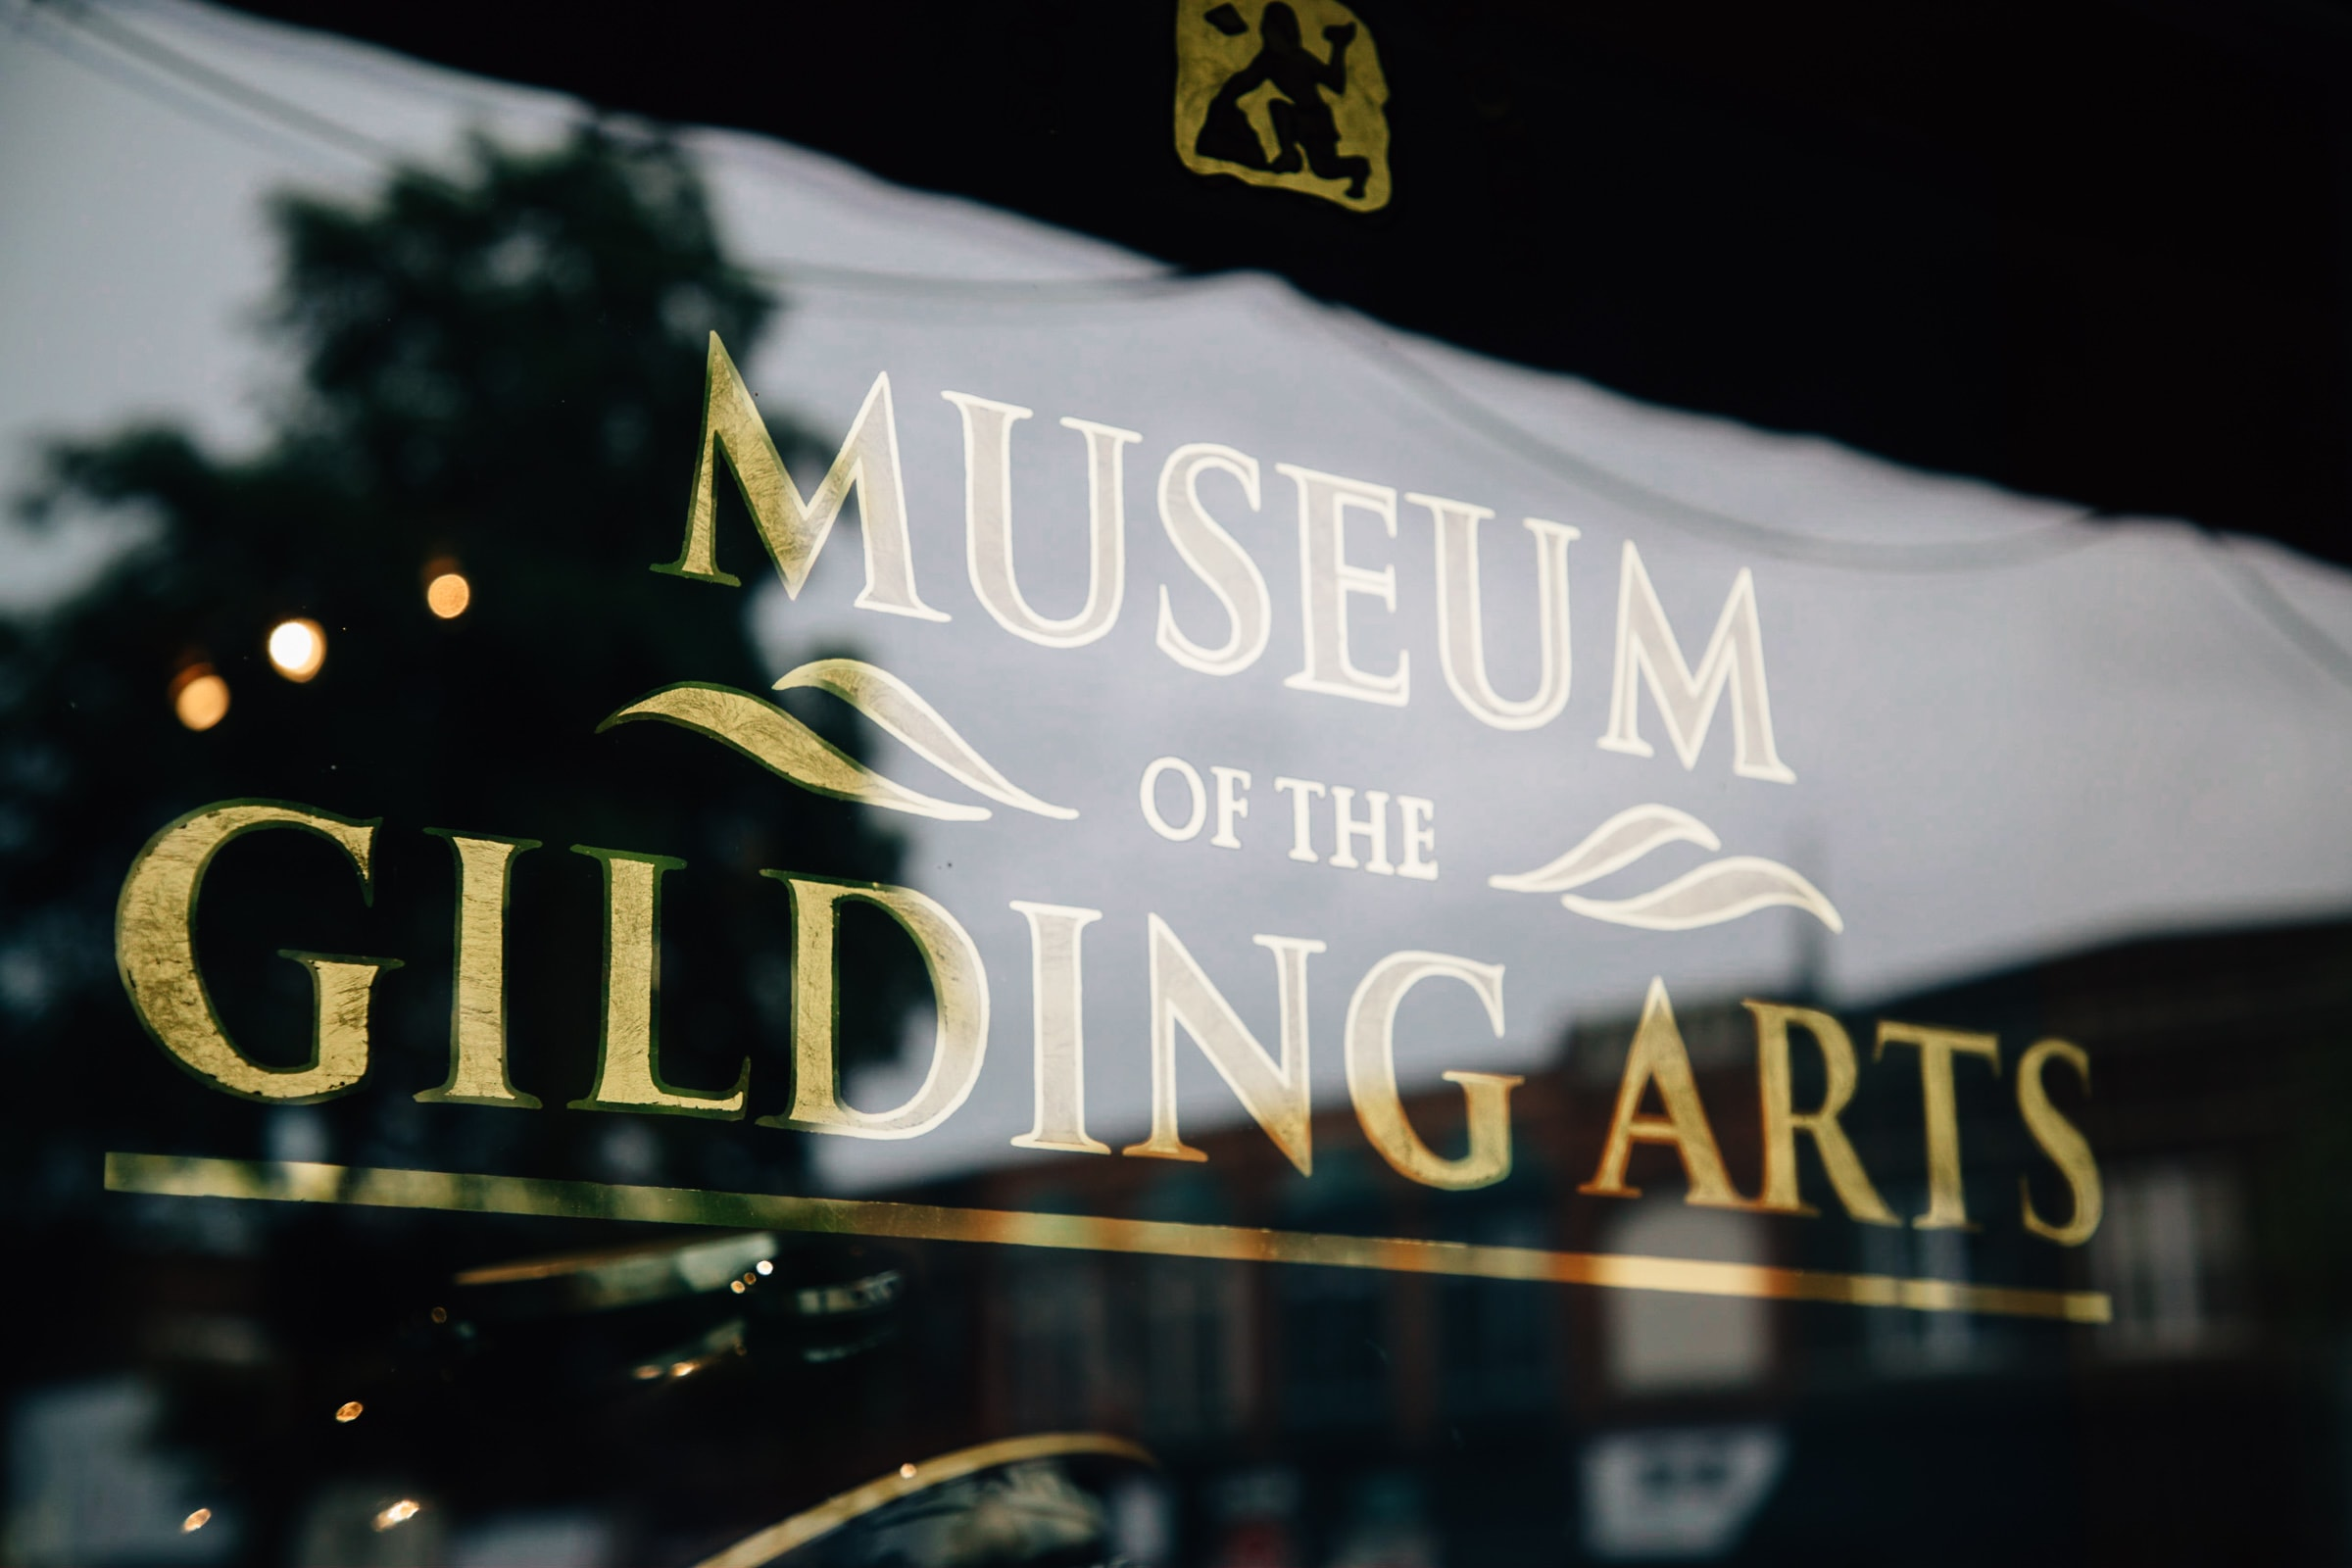 Pontiac Illinois Museum of the Gilding Arts